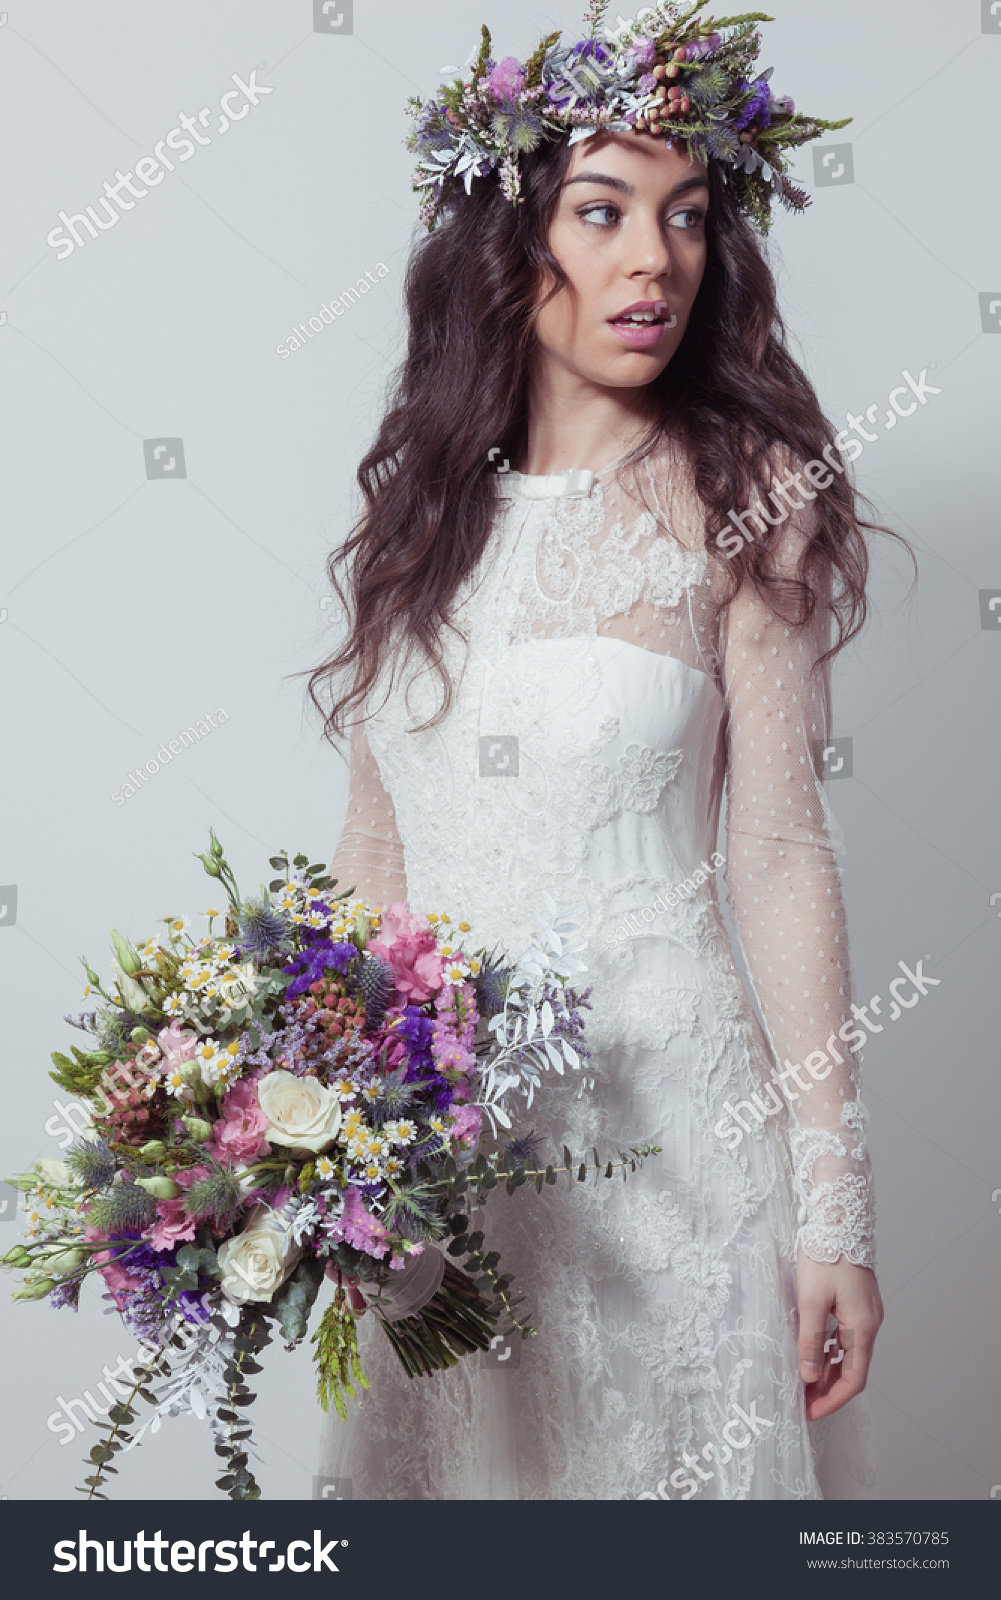 Bride bouquet flower crown posing stock photo edit now 383570785 bride with bouquet and flower crown posing izmirmasajfo